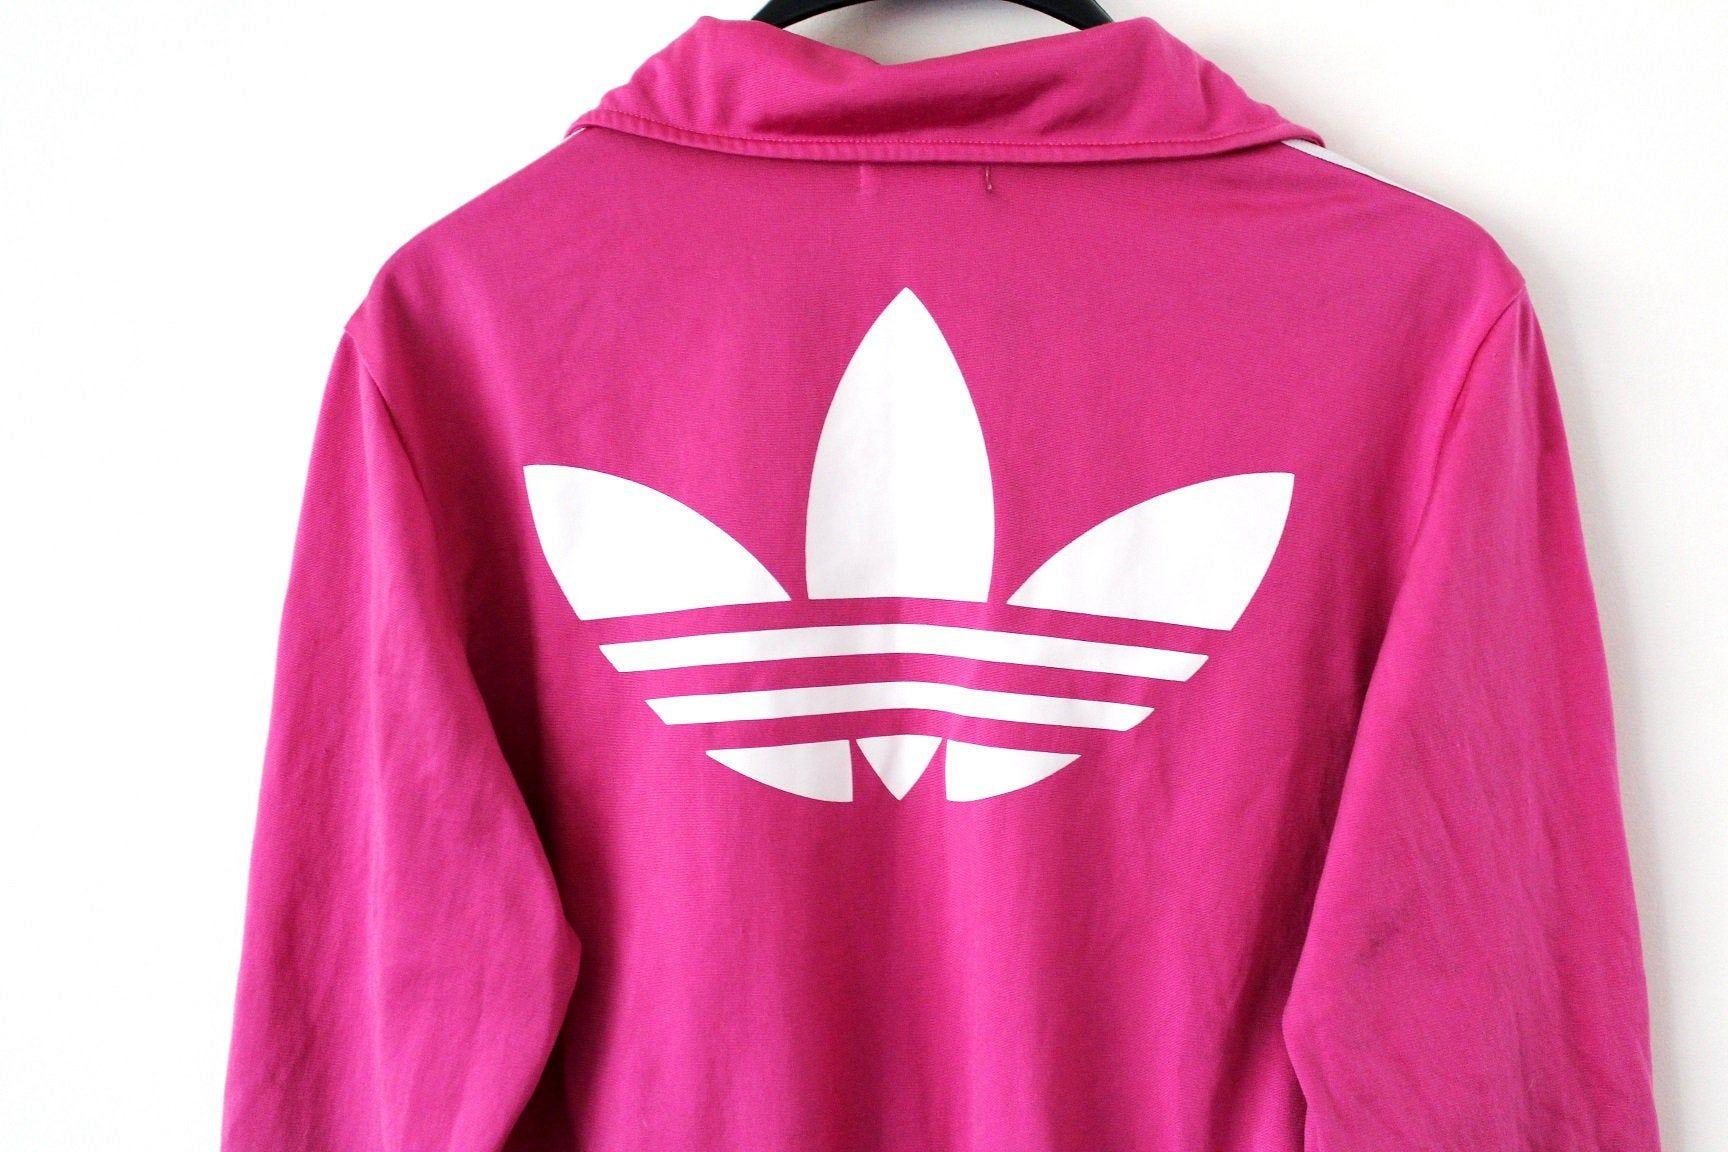 Existe Velas consola  Vintage Adidas Trefoil Jacket Pink White Adidas Windbreaker Adidas  Tracksuit Rare Women's Adida… | Pink and white adidas, Adidas windbreaker, Pink  adidas sweatshirt